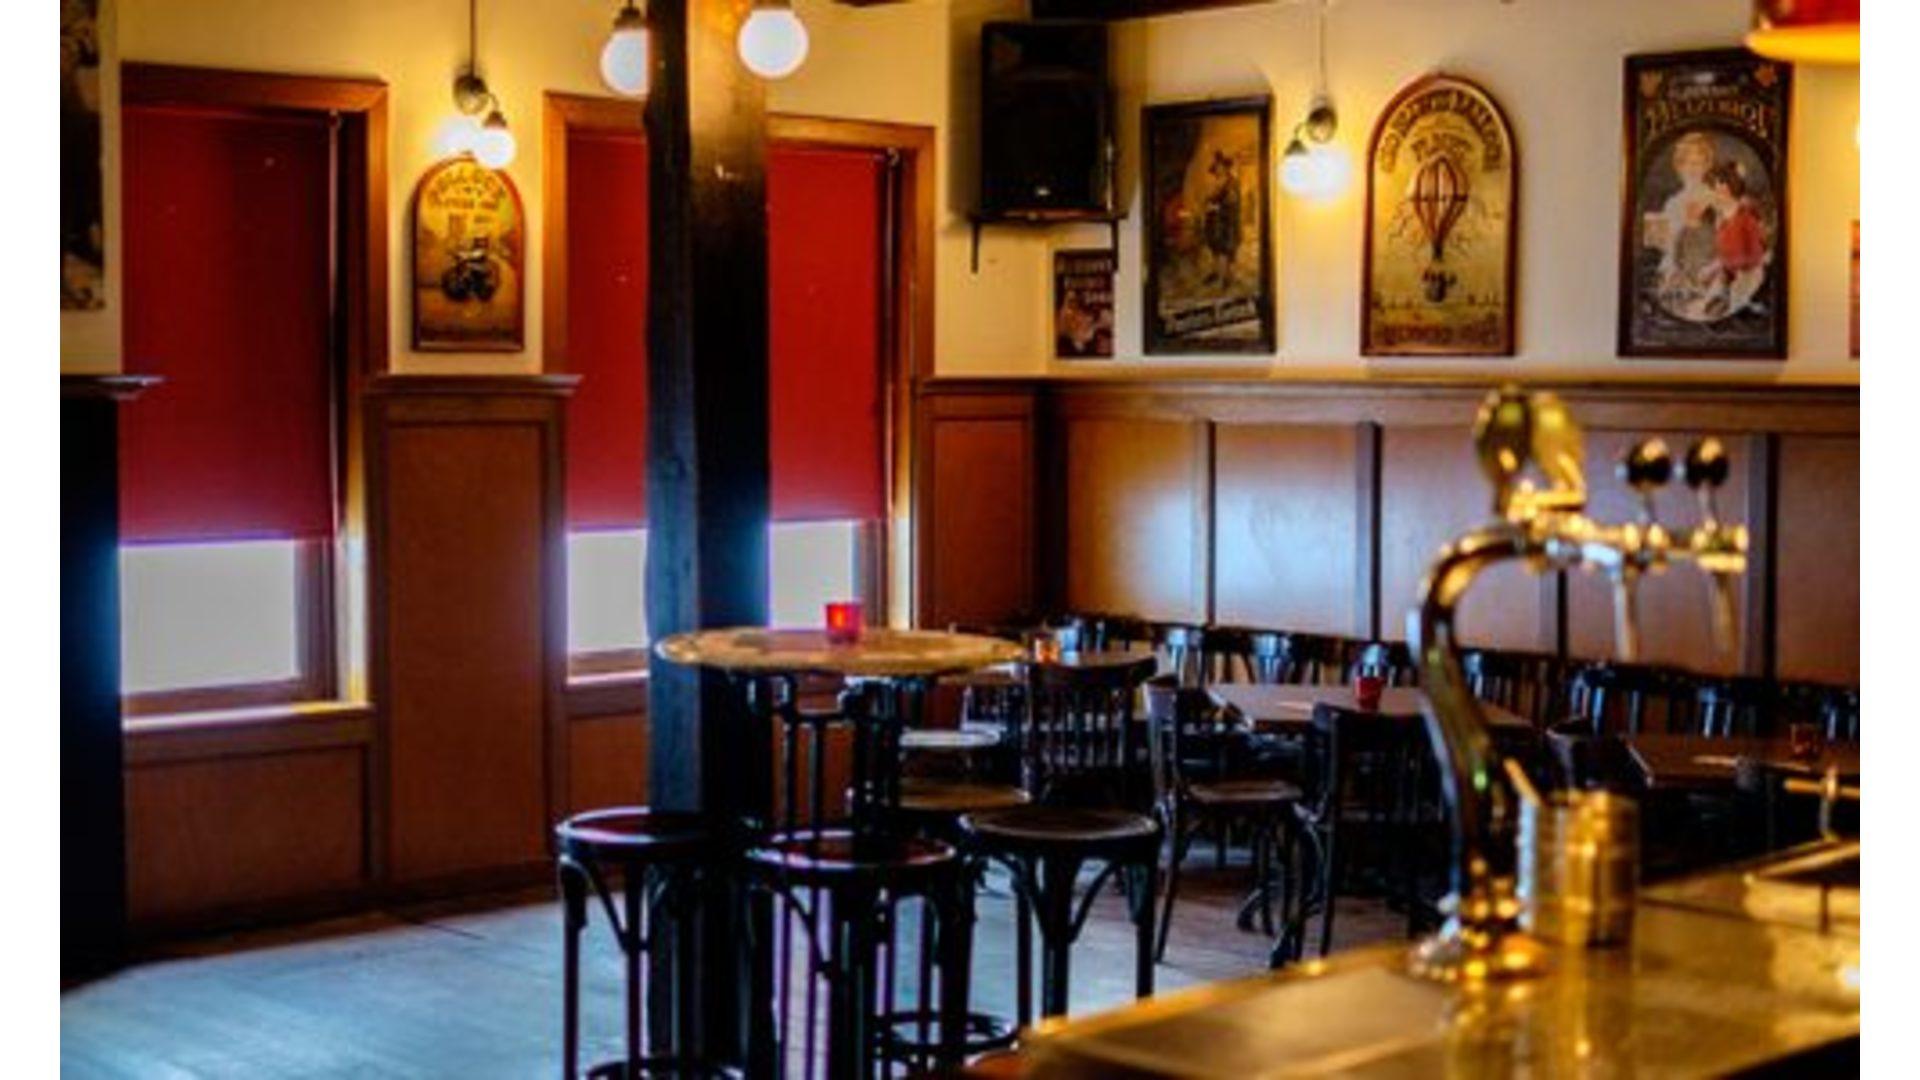 Café Bar 't Karrad